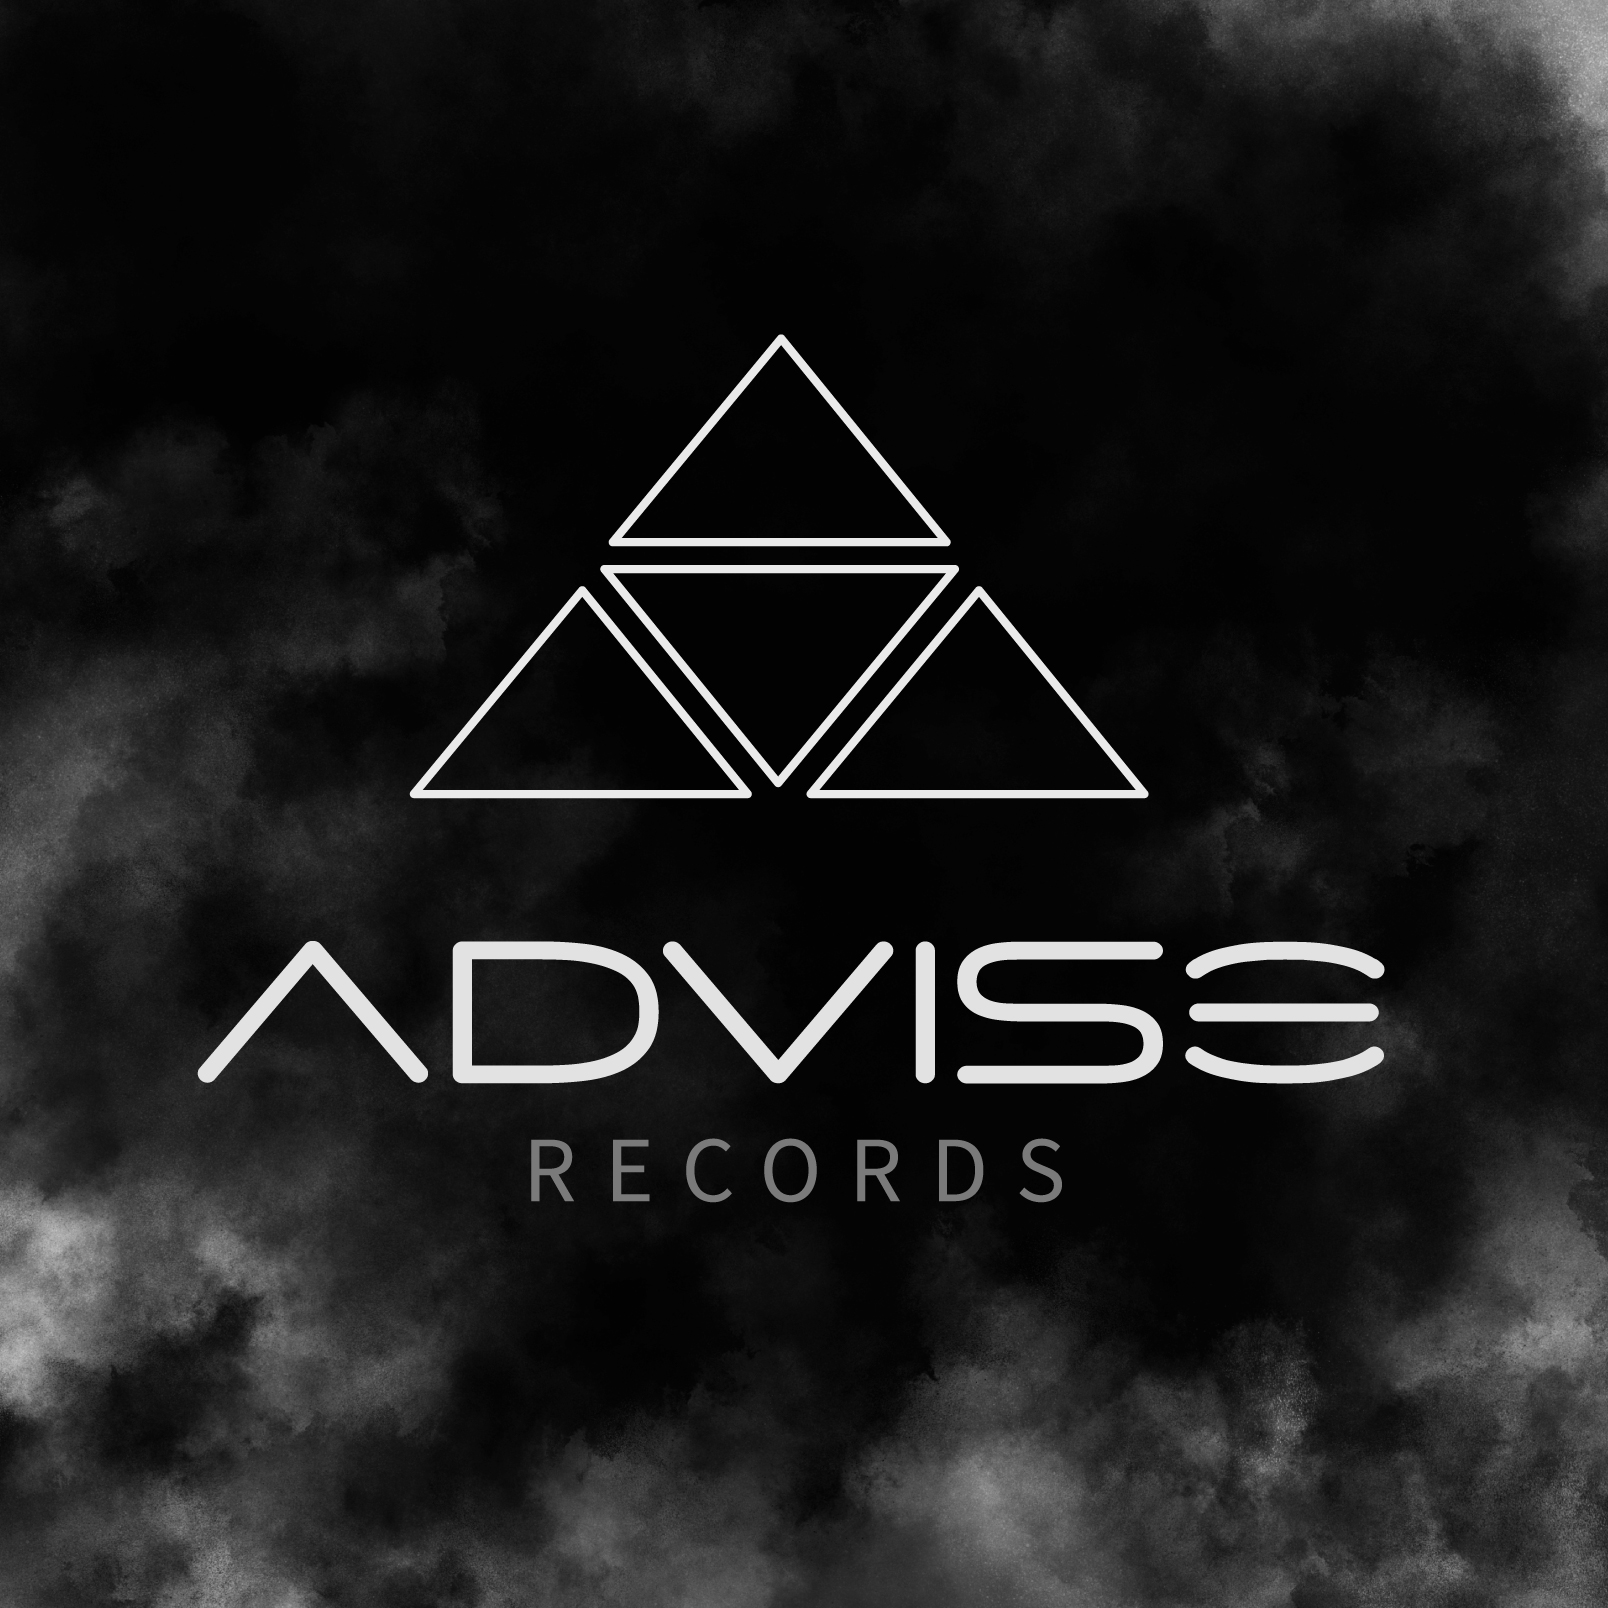 ADVISE RECORDS Image